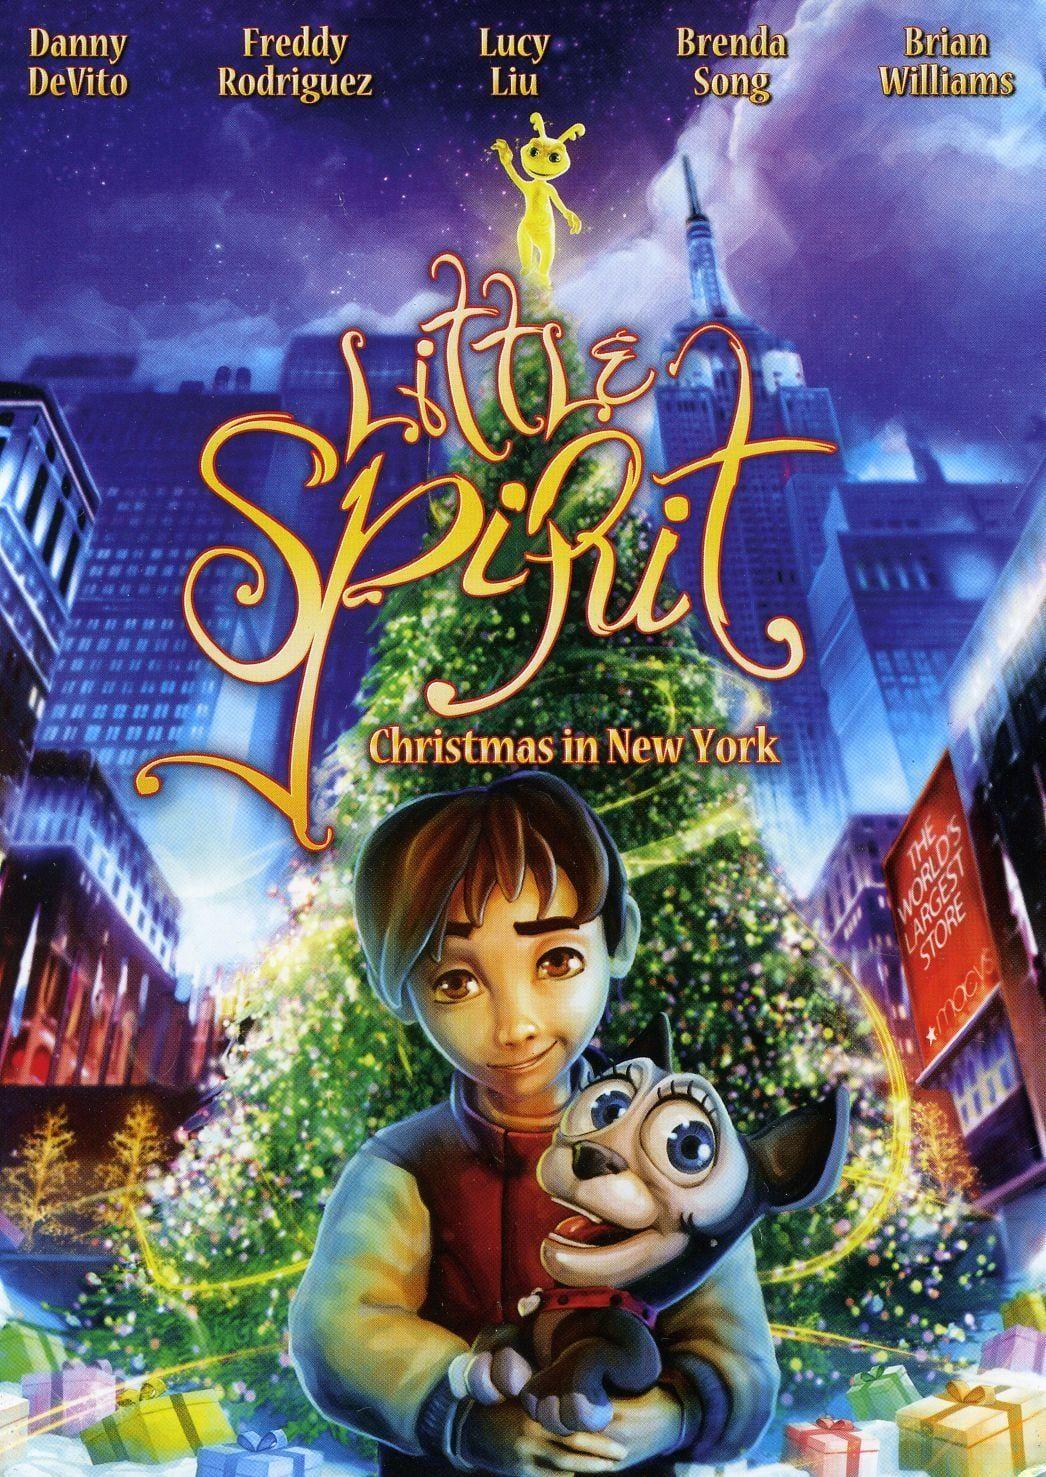 Ver Hd Little Spirit Christmas In New York 2008 Pelicula Completa Gratis Online En Espanol Lati Peliculas Completas Gratis Peliculas Completas Peliculas